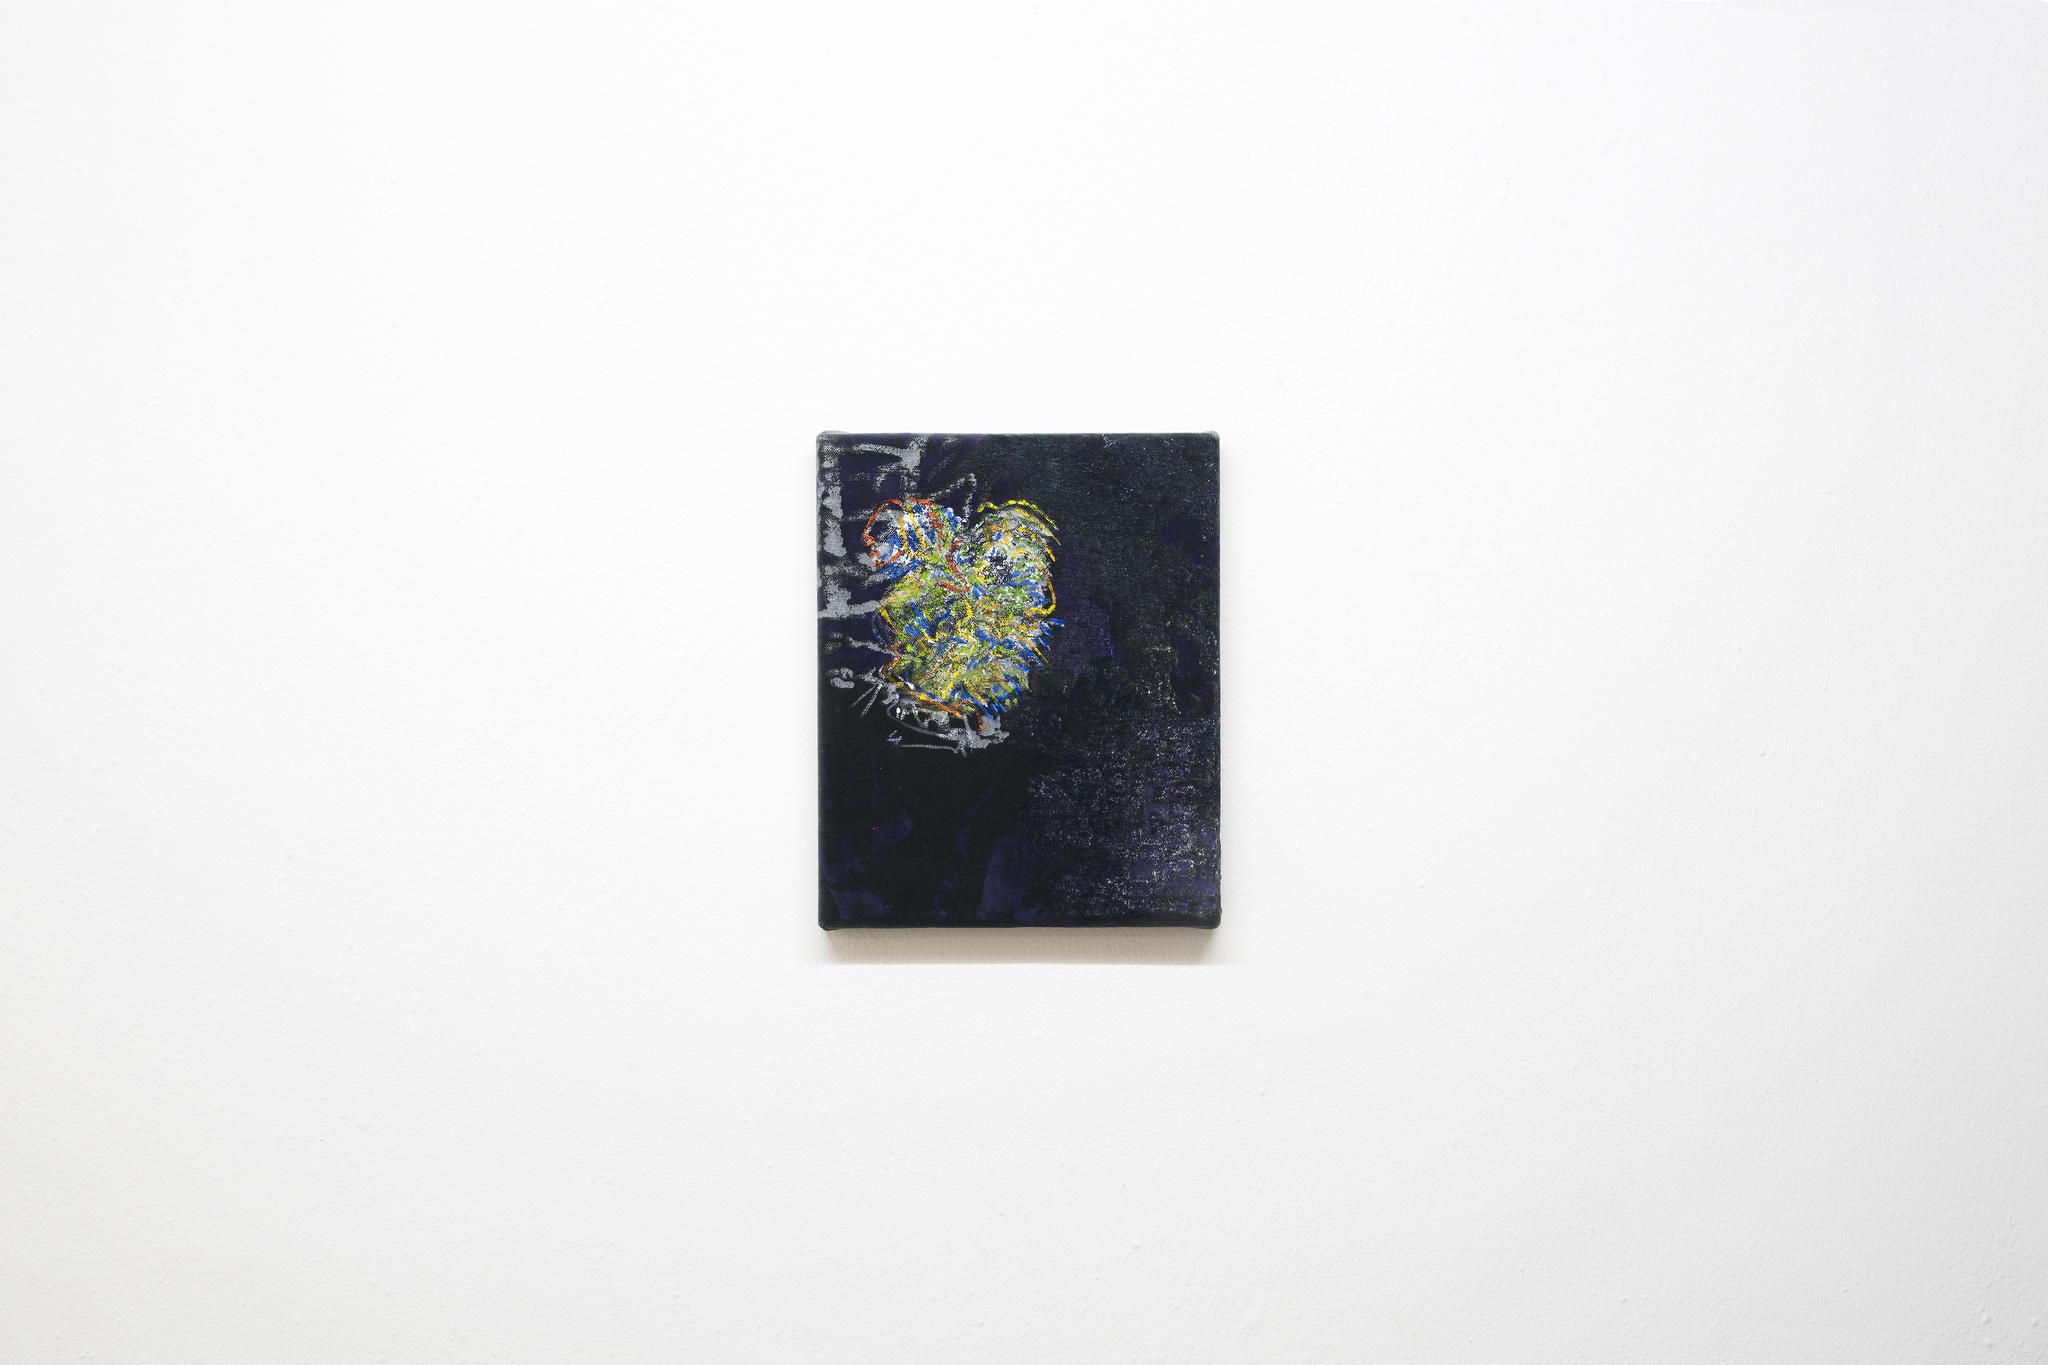 Anna Schachinger, Untitled, 2017. Acrylic medium, oil and acrylic paint on velvet, 22 x 27 cm (8.5 x 10.5 in.)